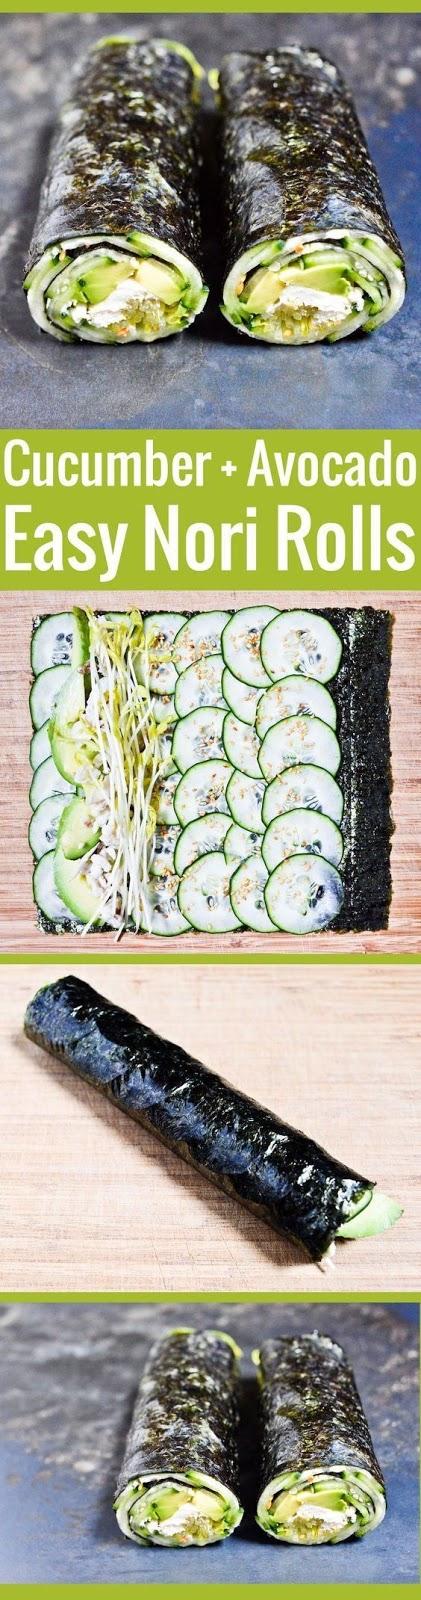 Quick Nori Roll with Cucumber and Avocado Recipe